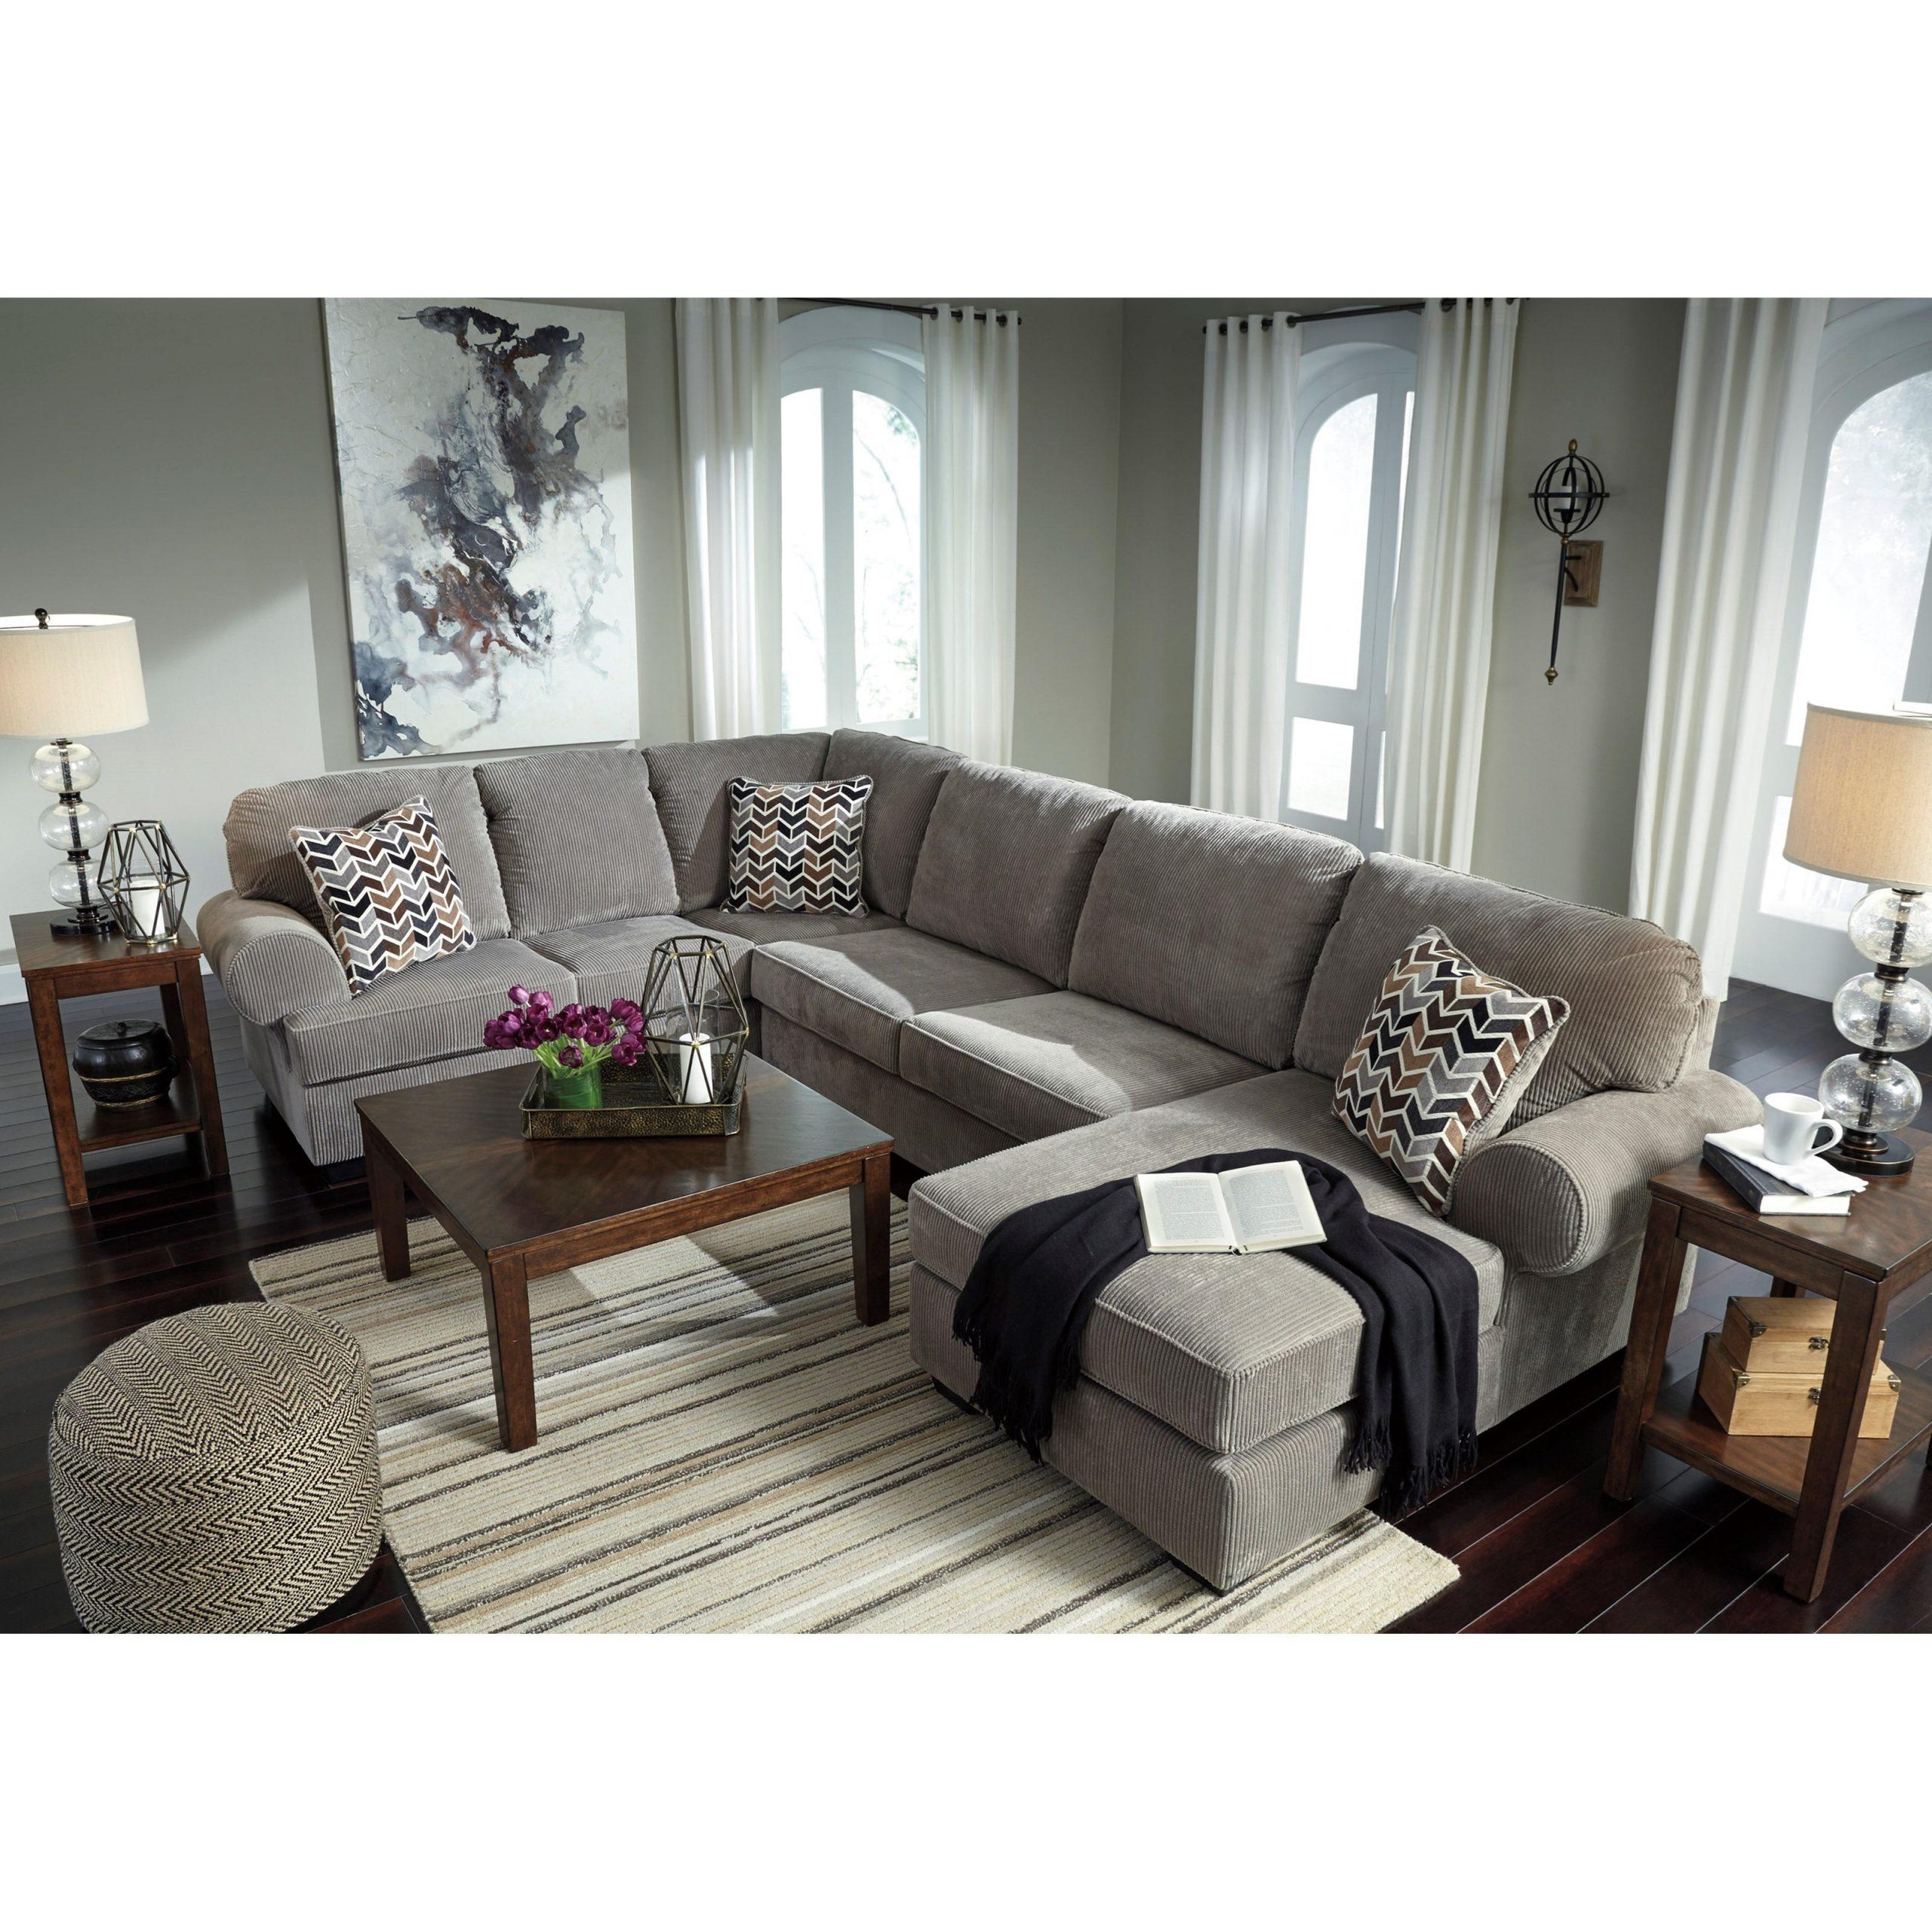 Signature Designashley Jinllingsly Contemporary 3 Regarding 3Pc Polyfiber Sectional Sofas (View 4 of 15)